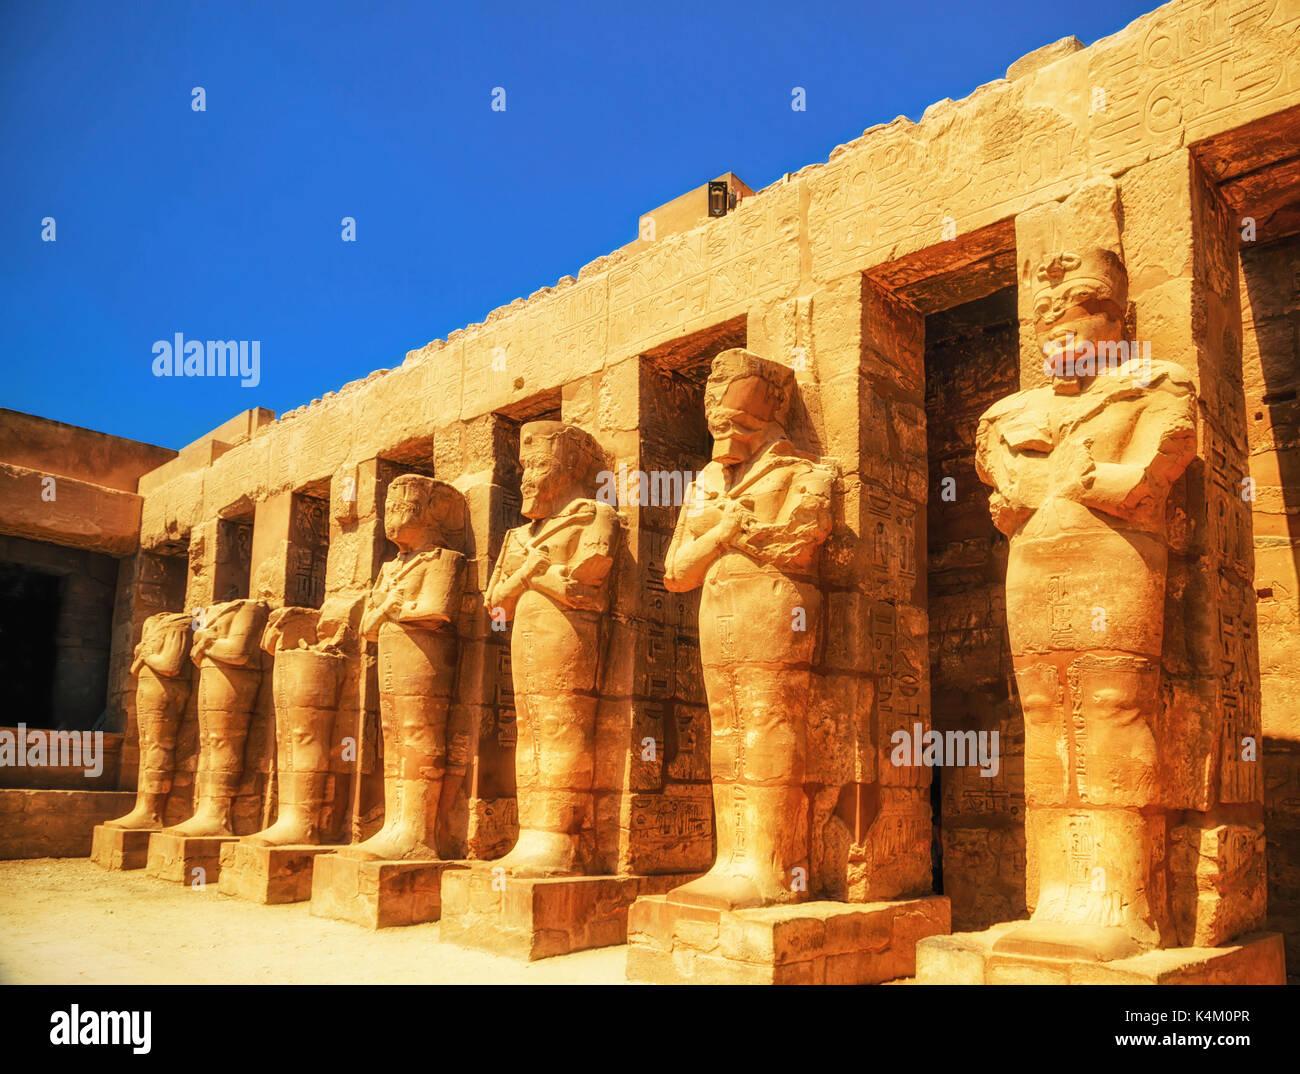 Temple de Karnak, Hall de cariatides. Louxor, Egypte Photo Stock